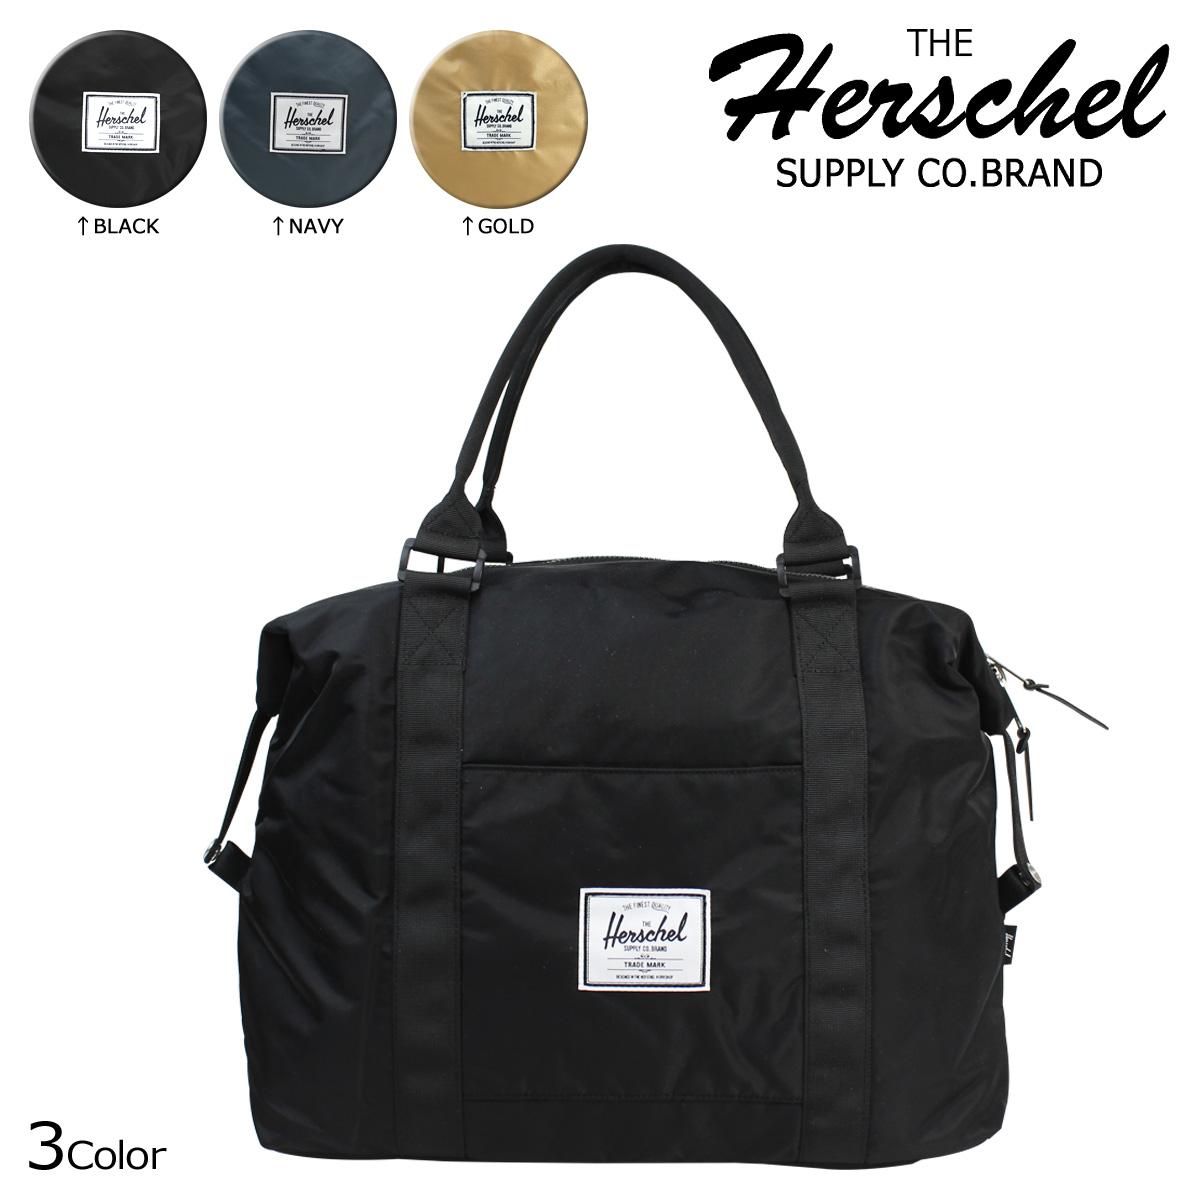 Herschel Novel Bag | Herschel Duffle Bag | Herschel Overnight Bag